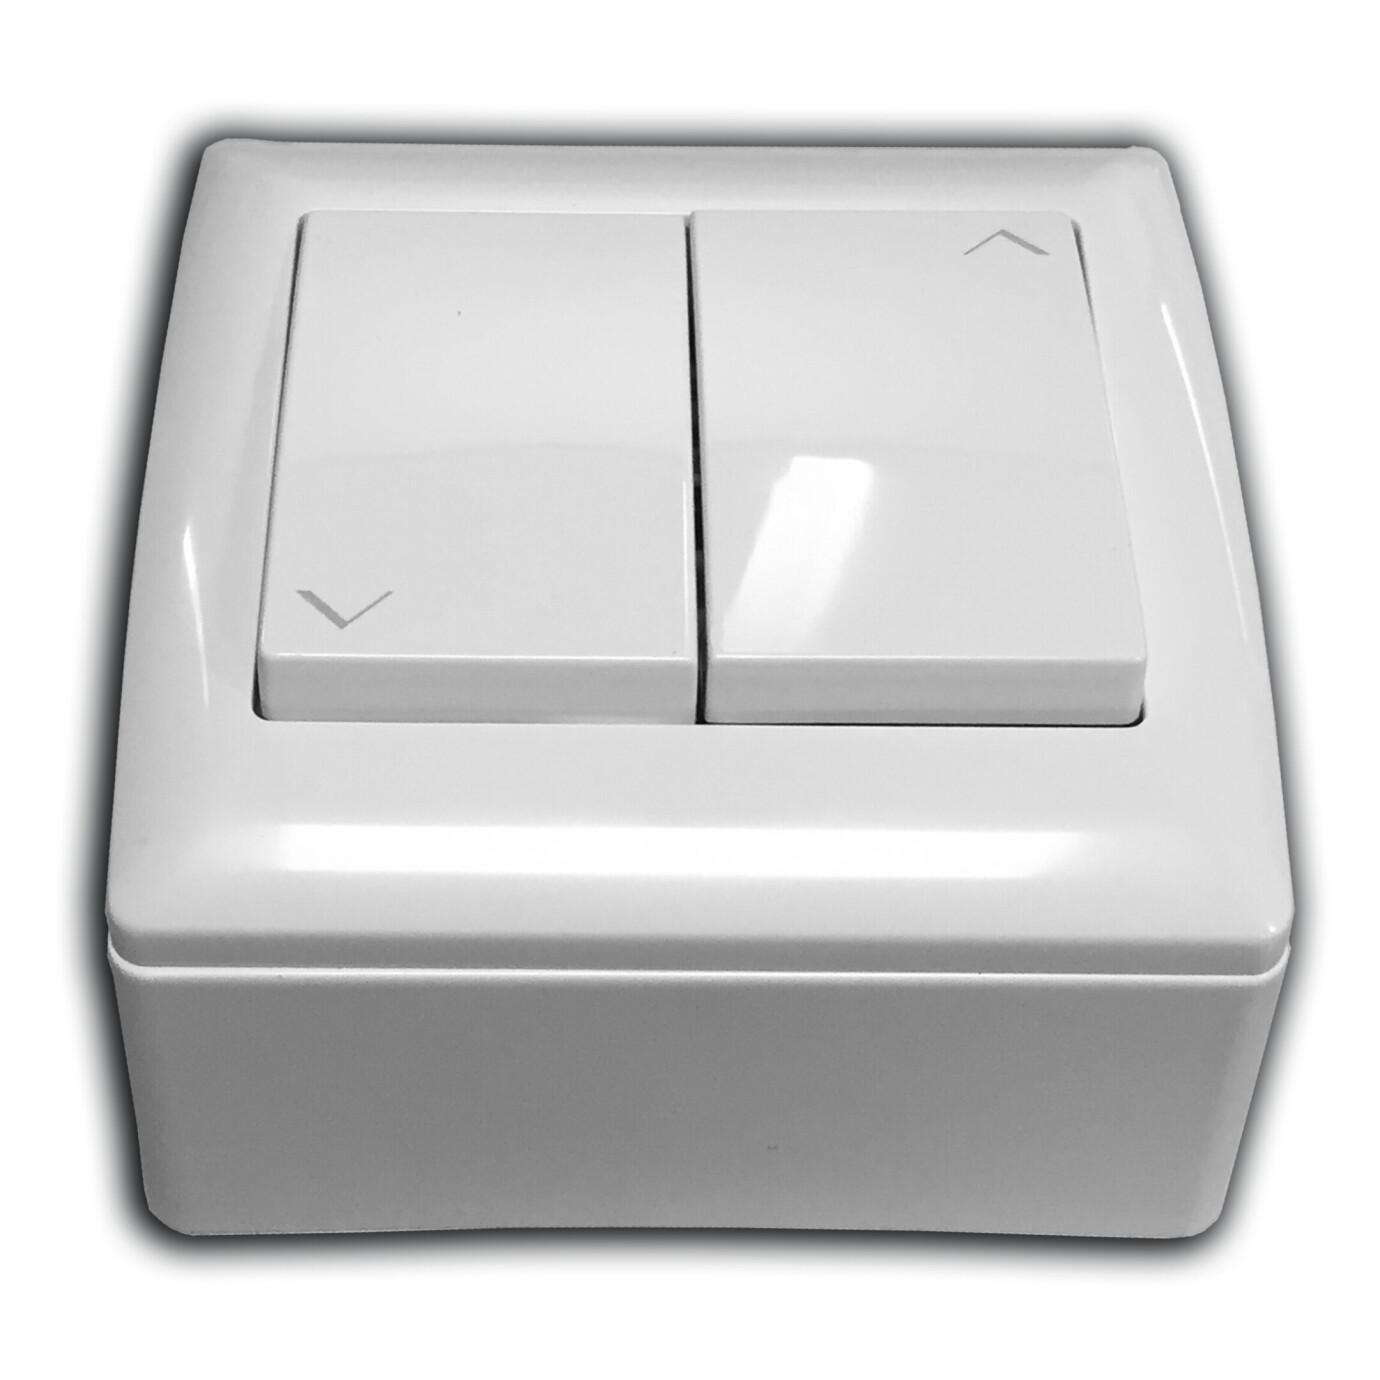 Interruptor de pared Celexon para pantallas Motorizadas Expert y Expert XL